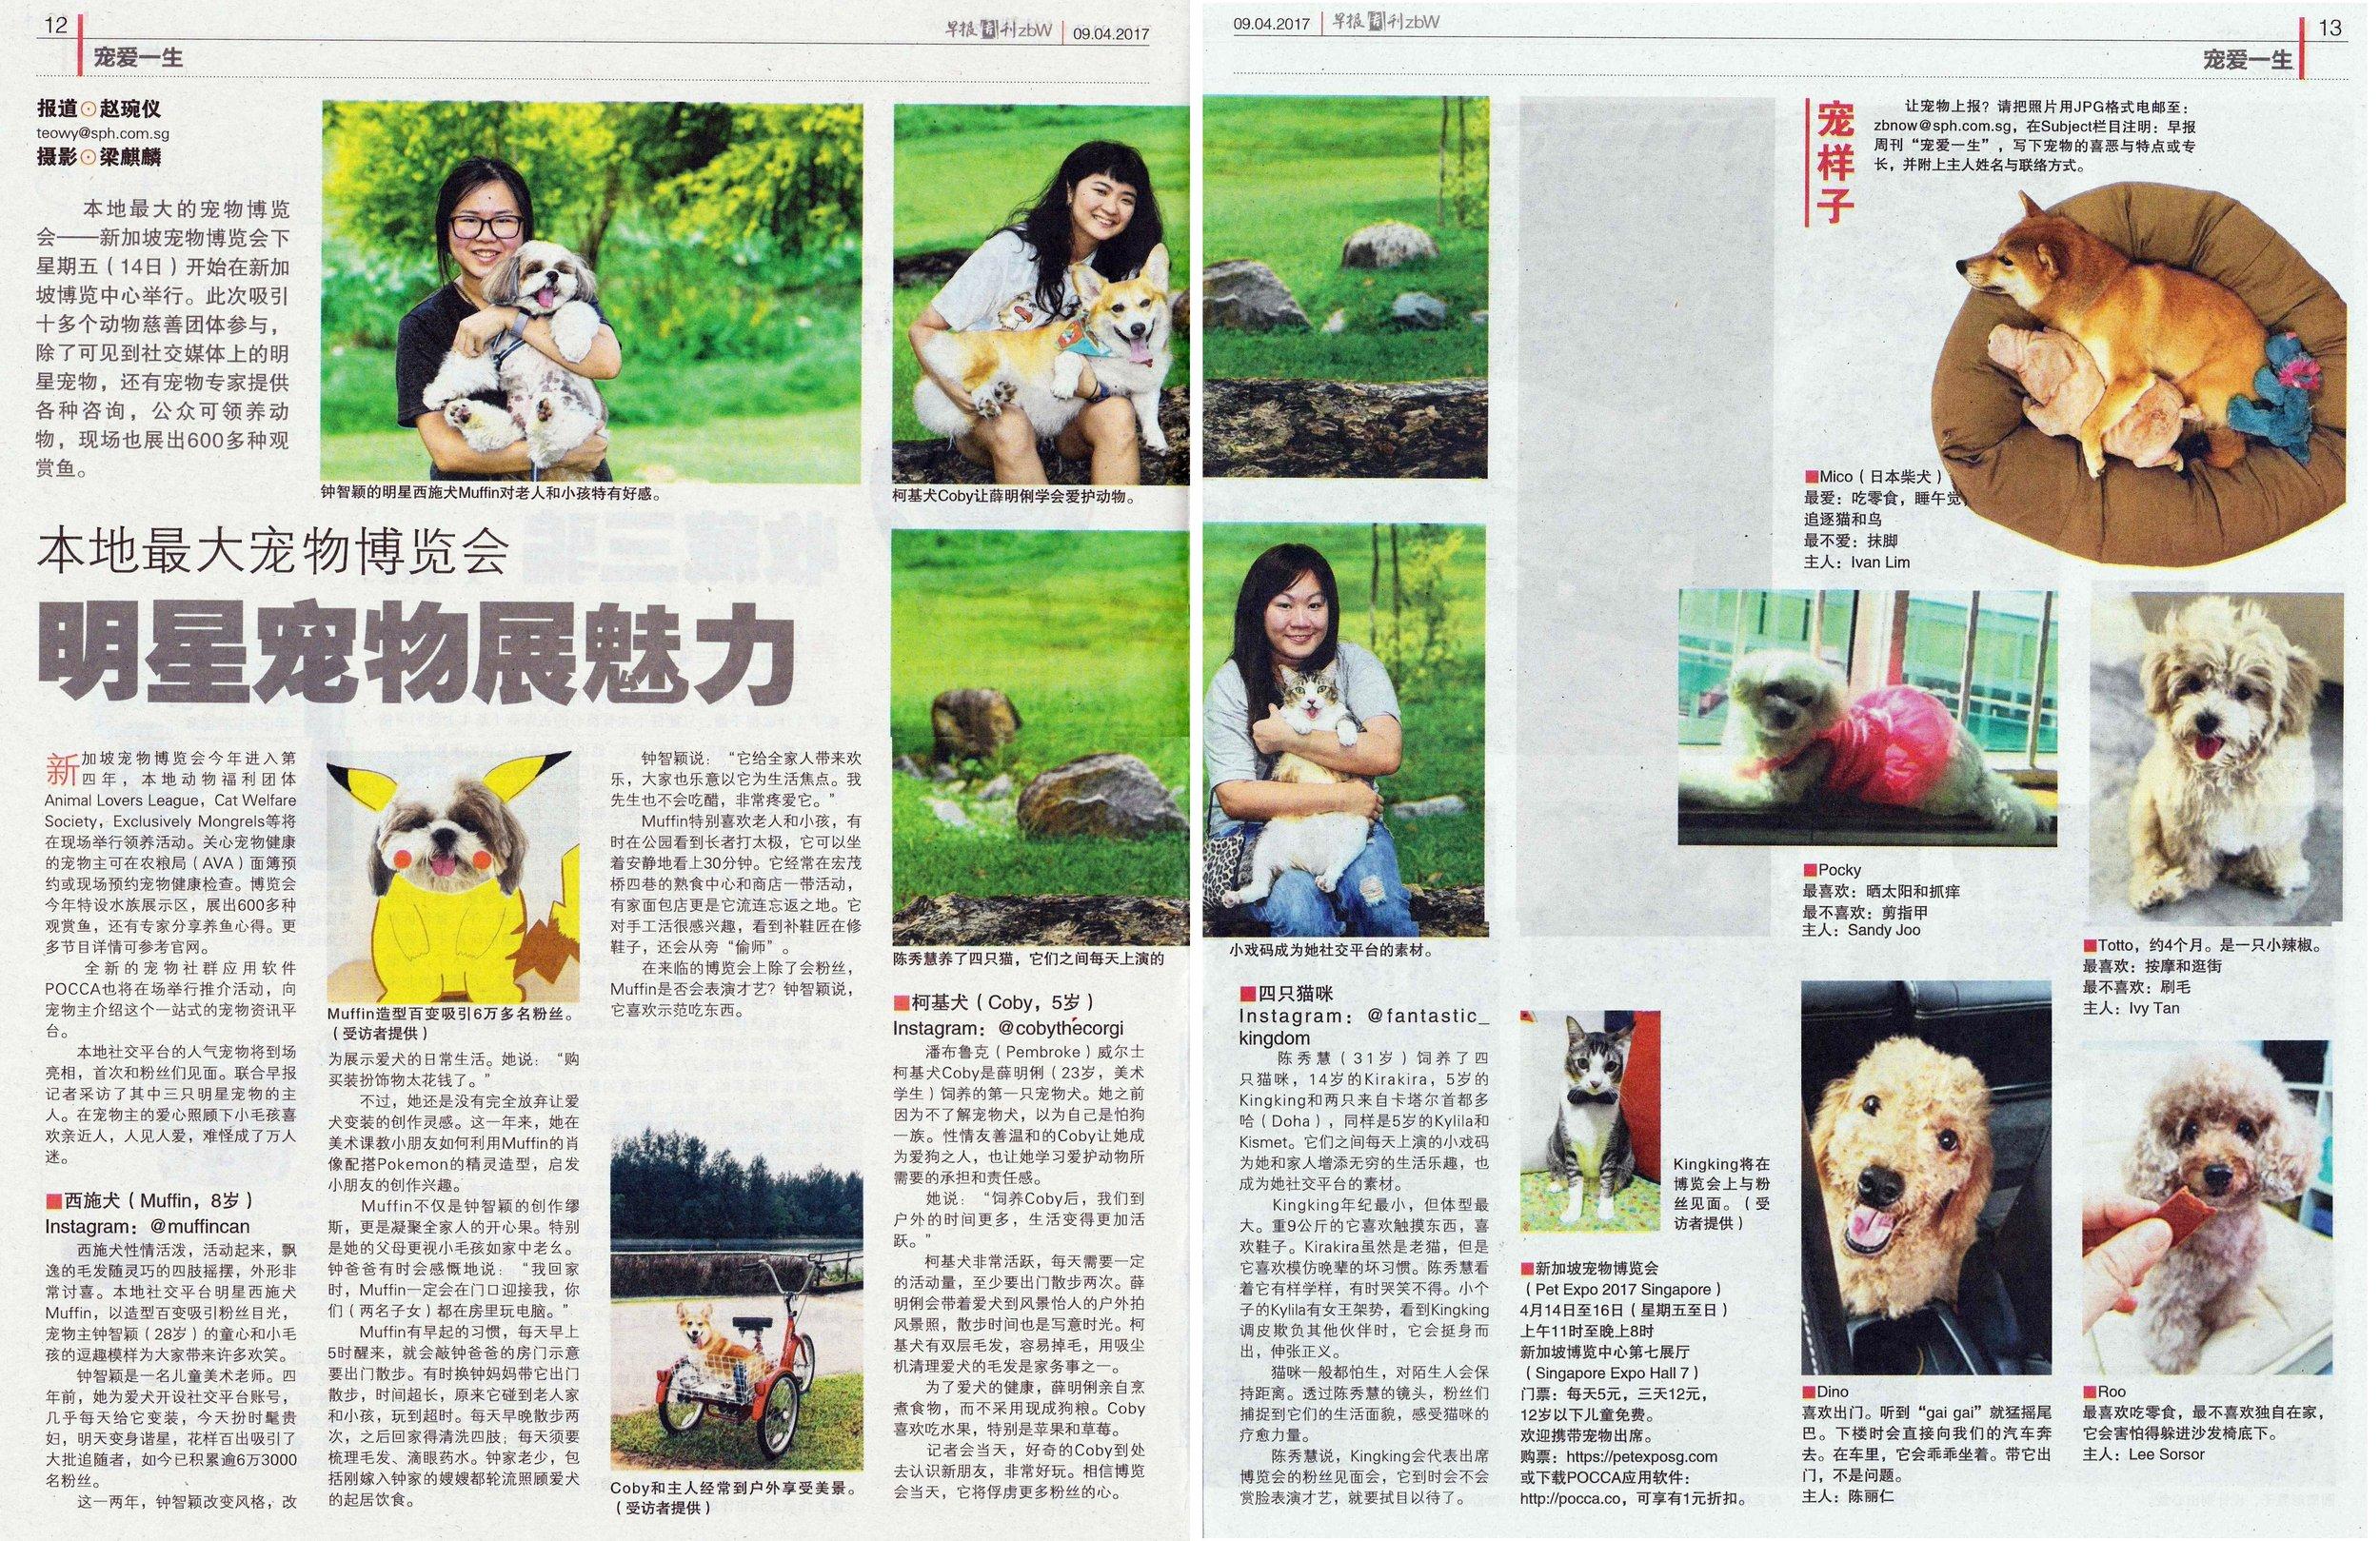 Lianhe Zaobao.jpg